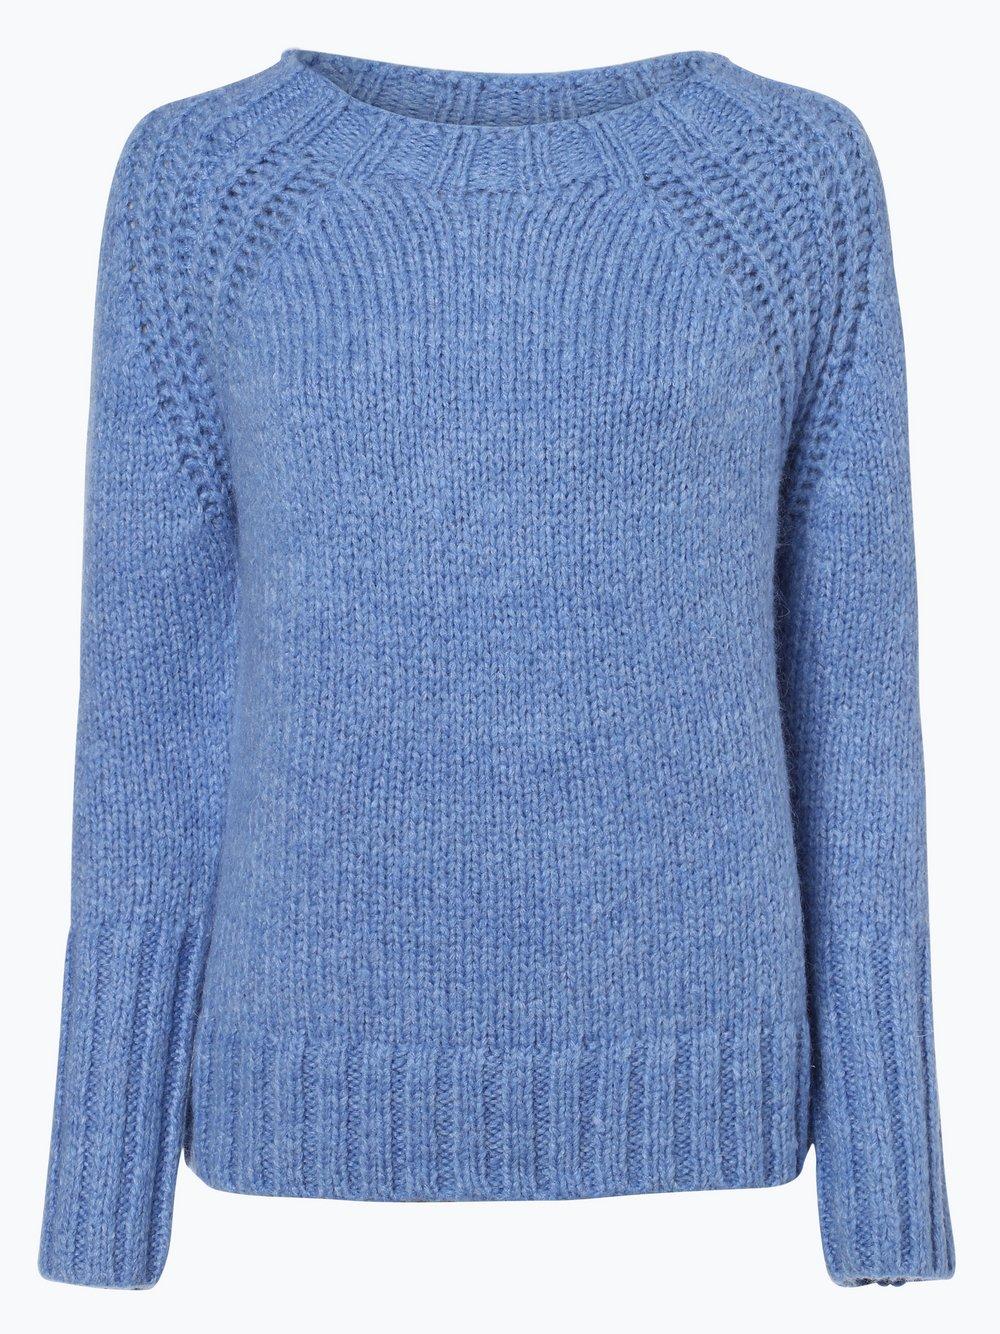 31599b8173e8 Marc O Polo Damen Pullover mit Mohair-Anteil online kaufen   PEEK ...